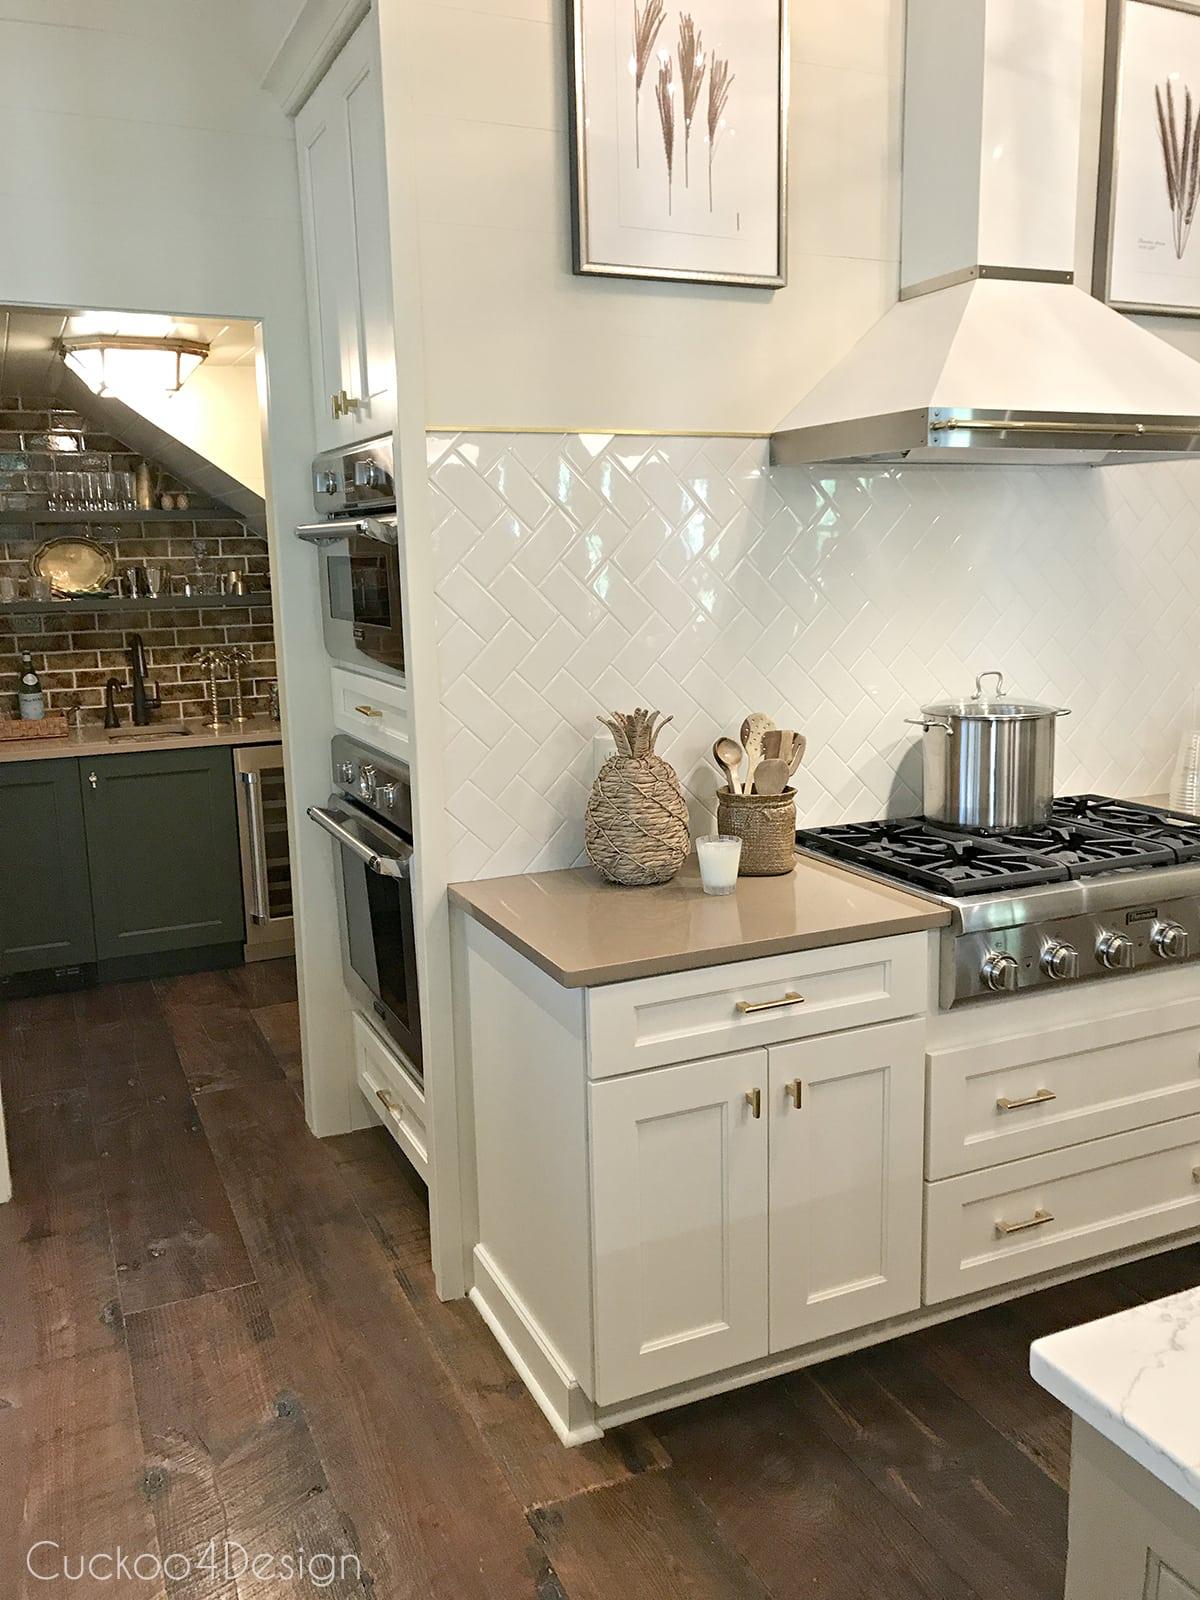 Southern Living Idea House 2017 (part 1)   Cuckoo4Design